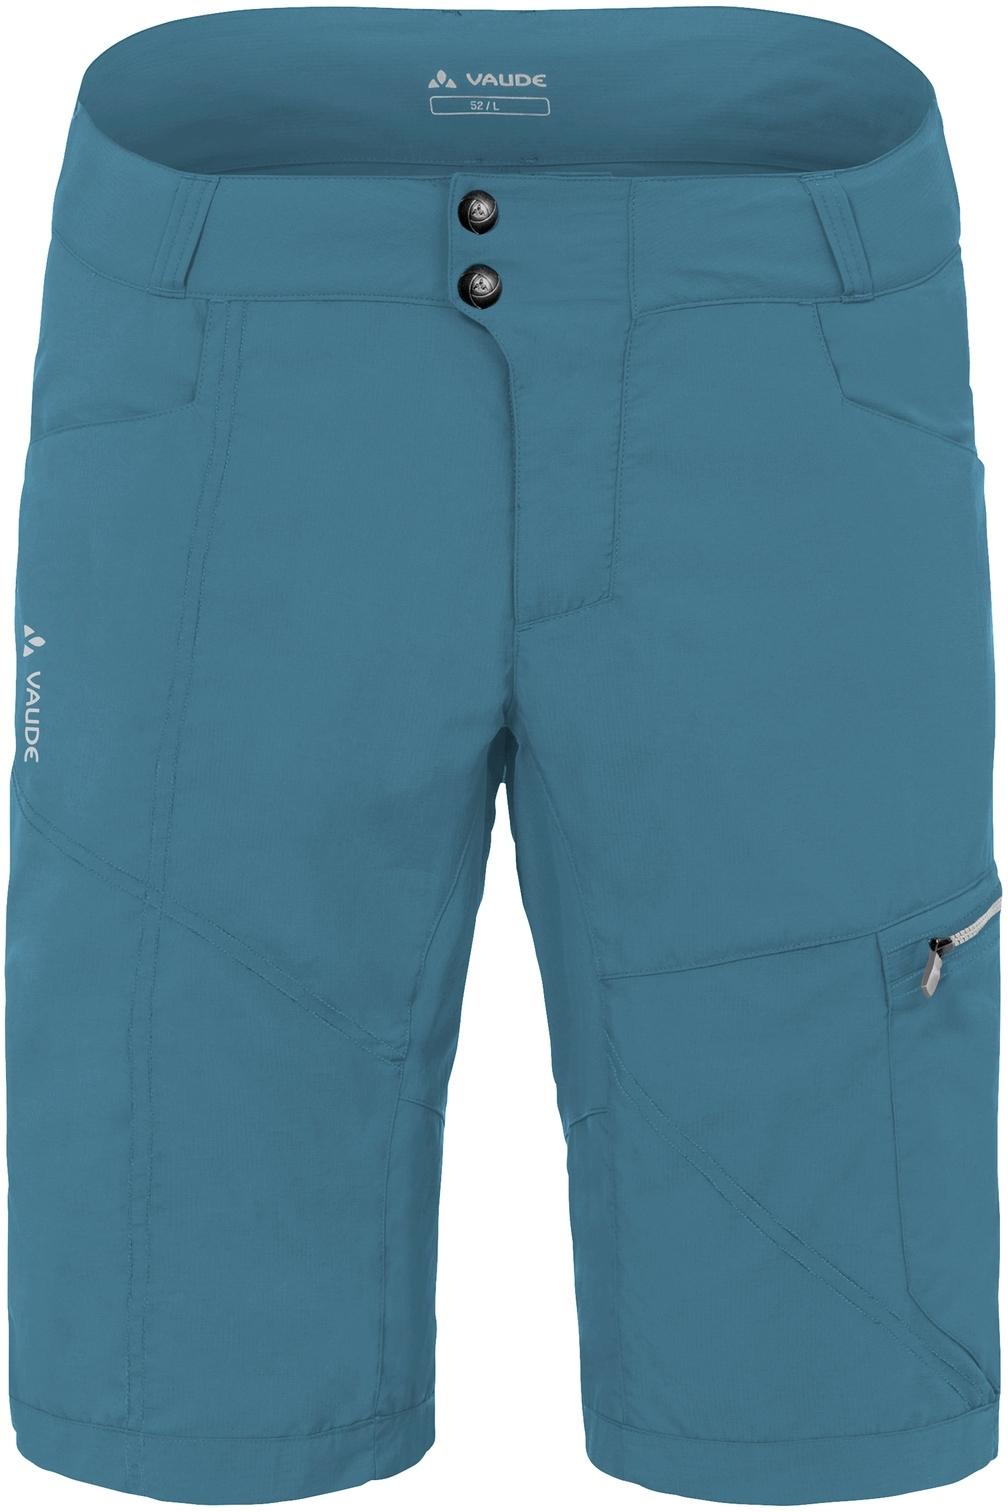 Vaude Men's Tamaro Shorts - blue grey